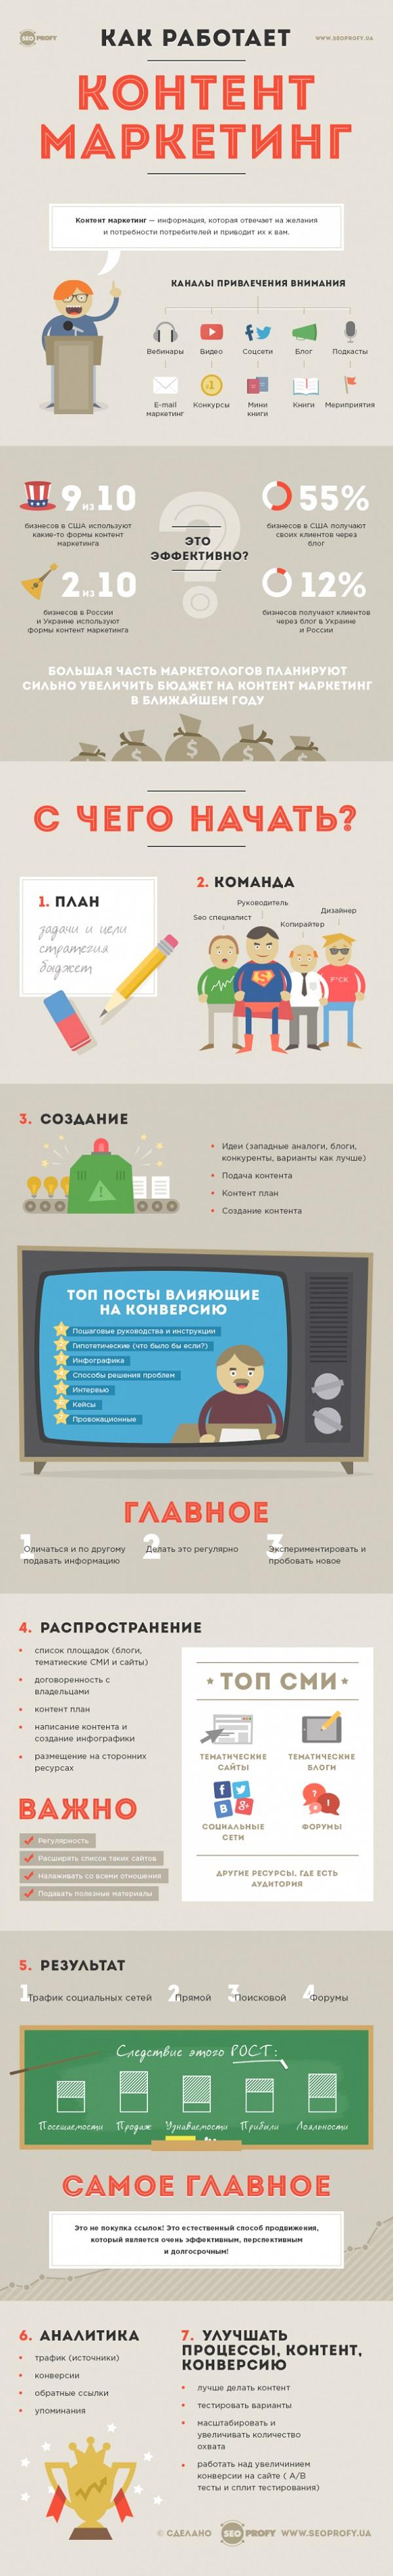 Контент маркетинг Инфографика